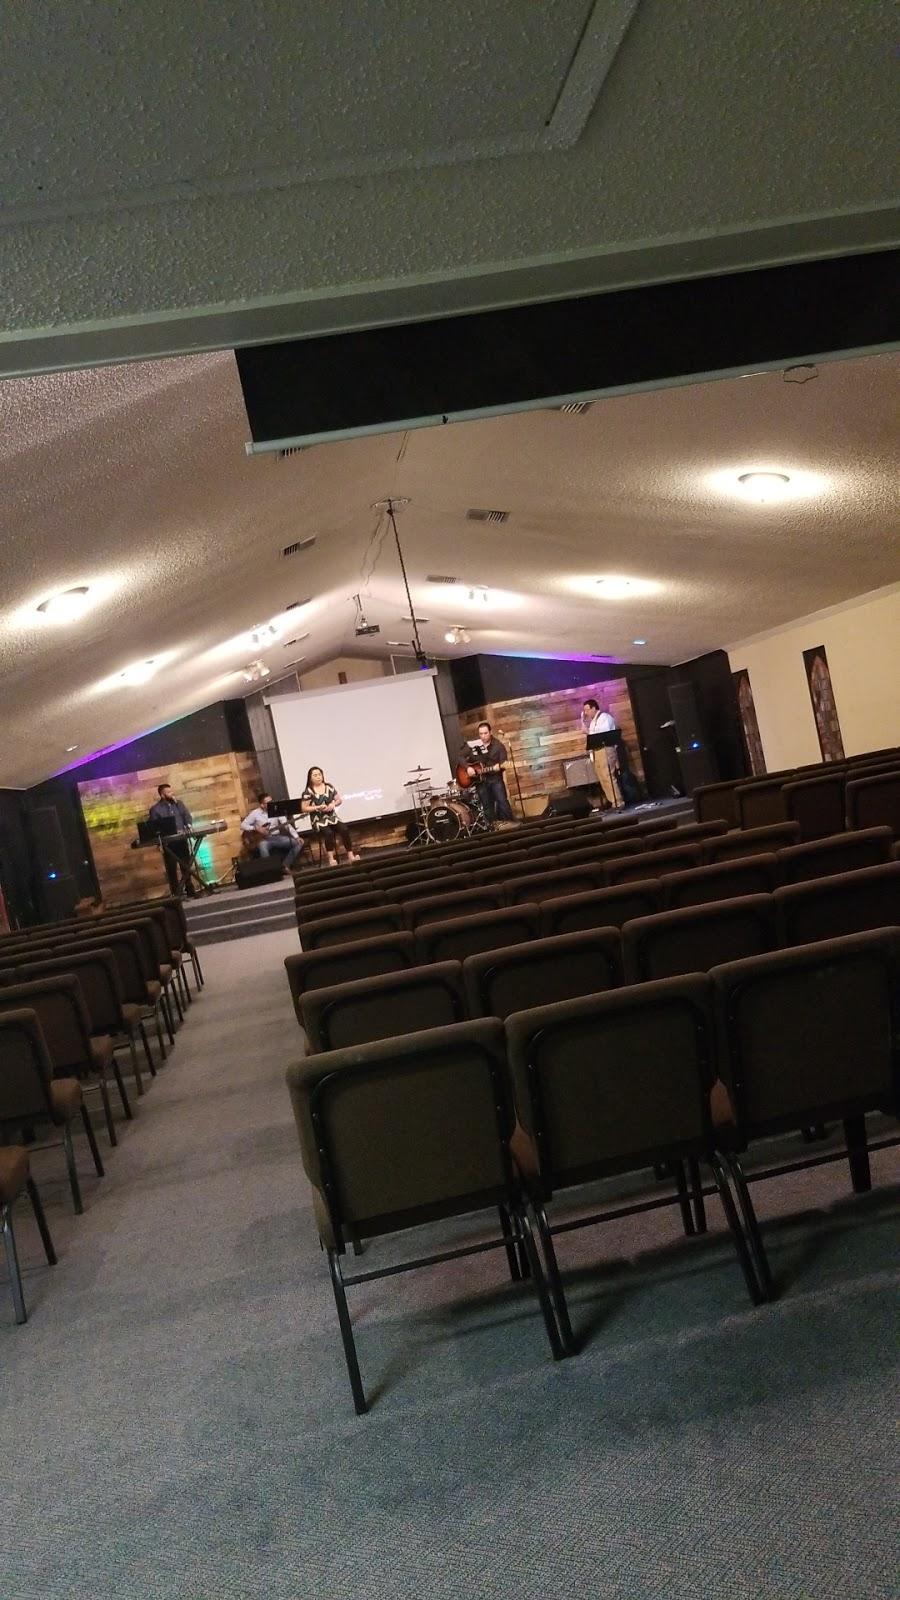 Mt. Zion Revival Center - church  | Photo 2 of 7 | Address: 2106 Jones Rd, Beeville, TX 78102, USA | Phone: (361) 343-5622